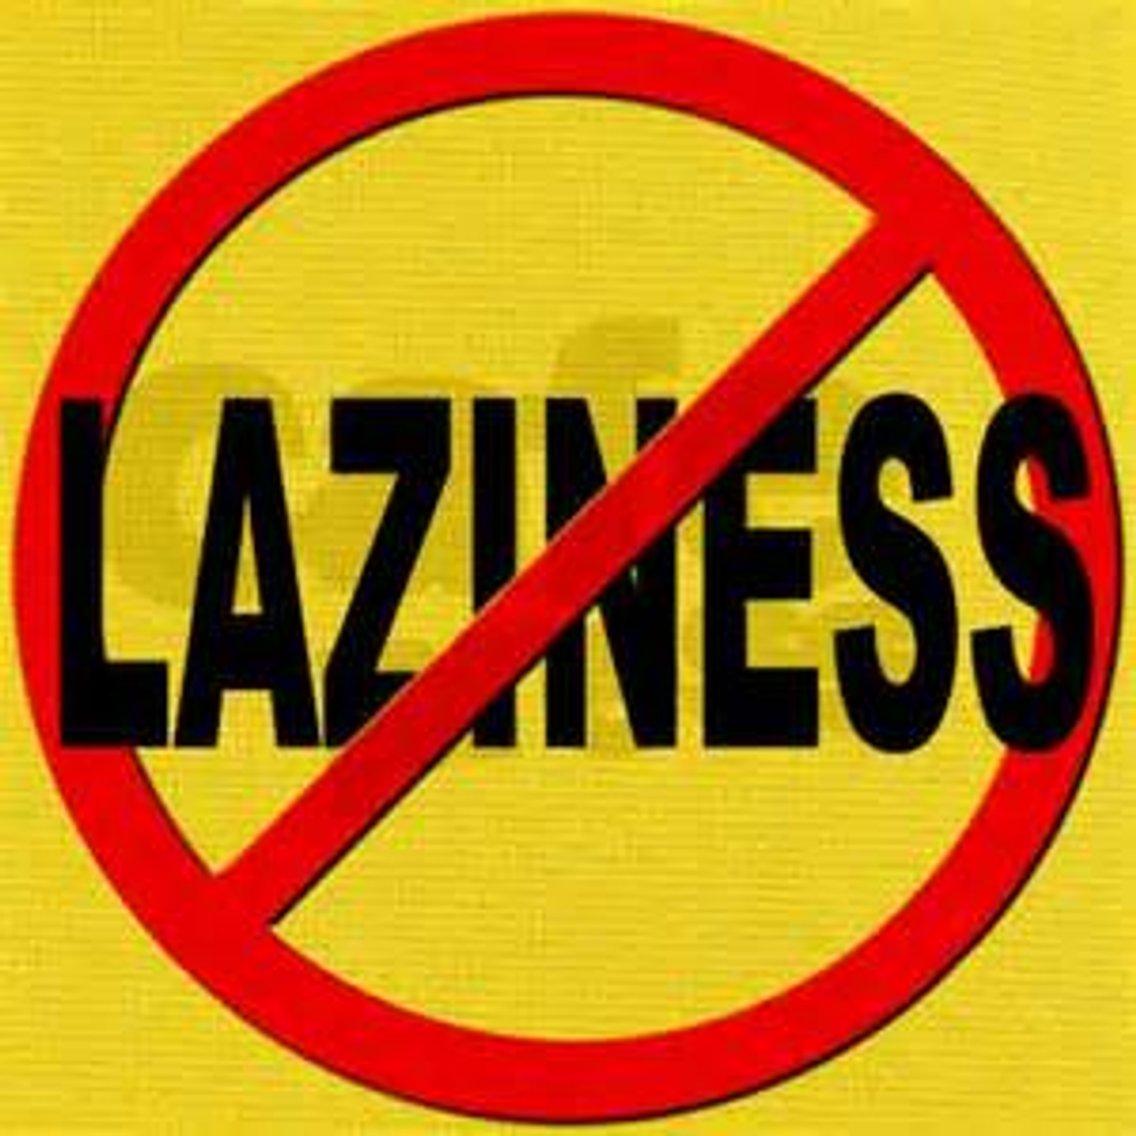 Avoiding Spiritual Laziness #1 - Cover Image